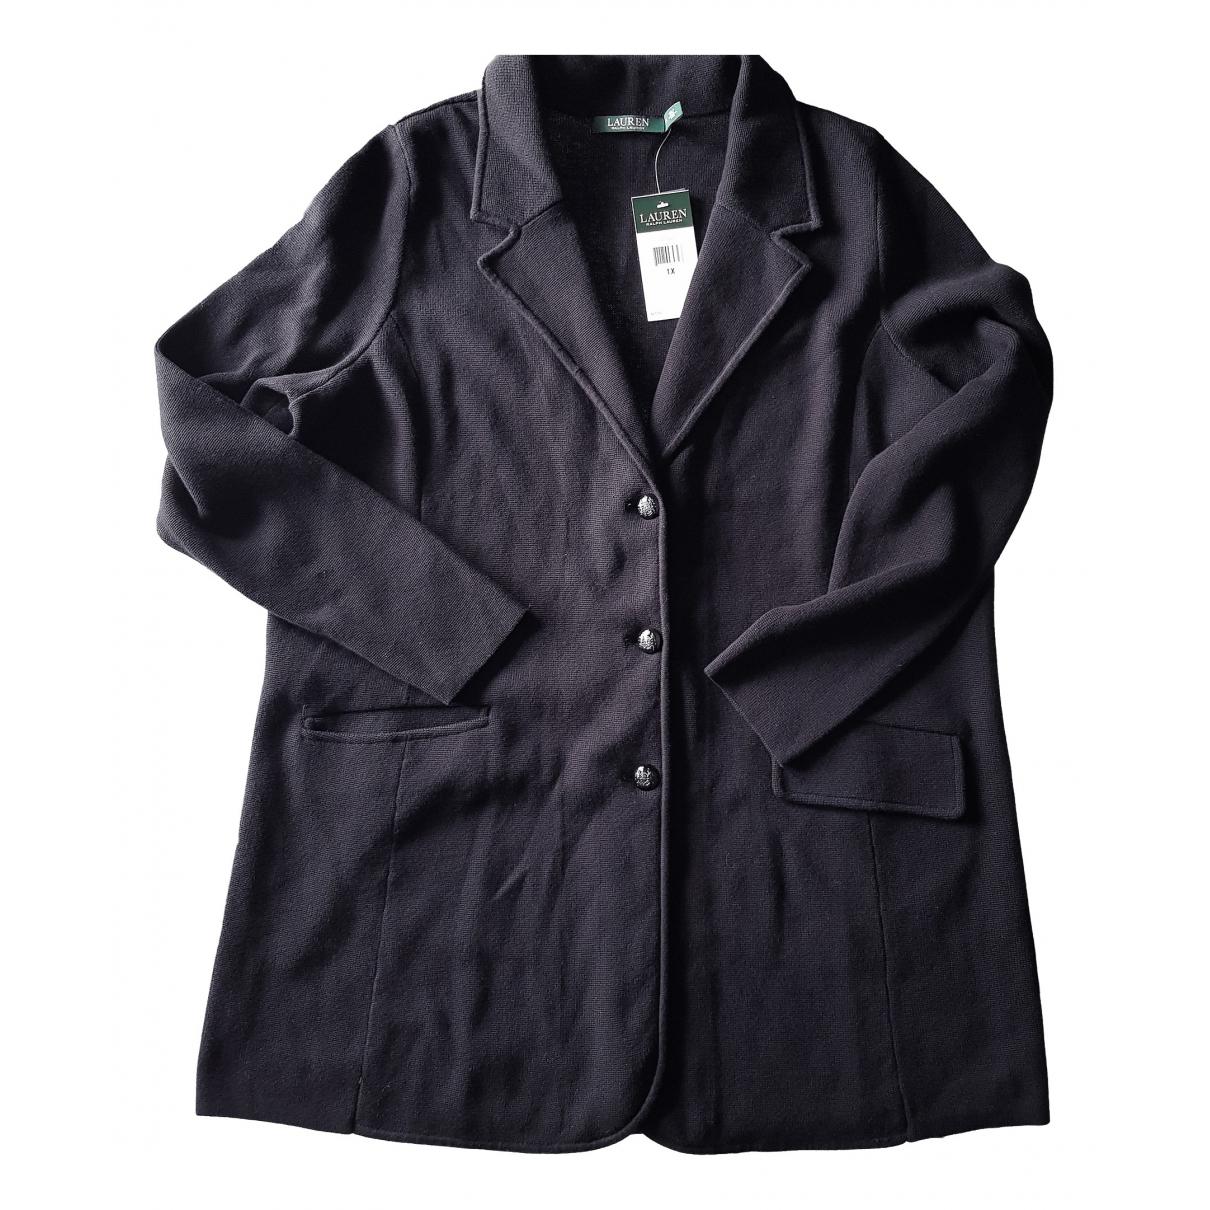 Lauren Ralph Lauren \N Black Cotton jacket for Women XL International